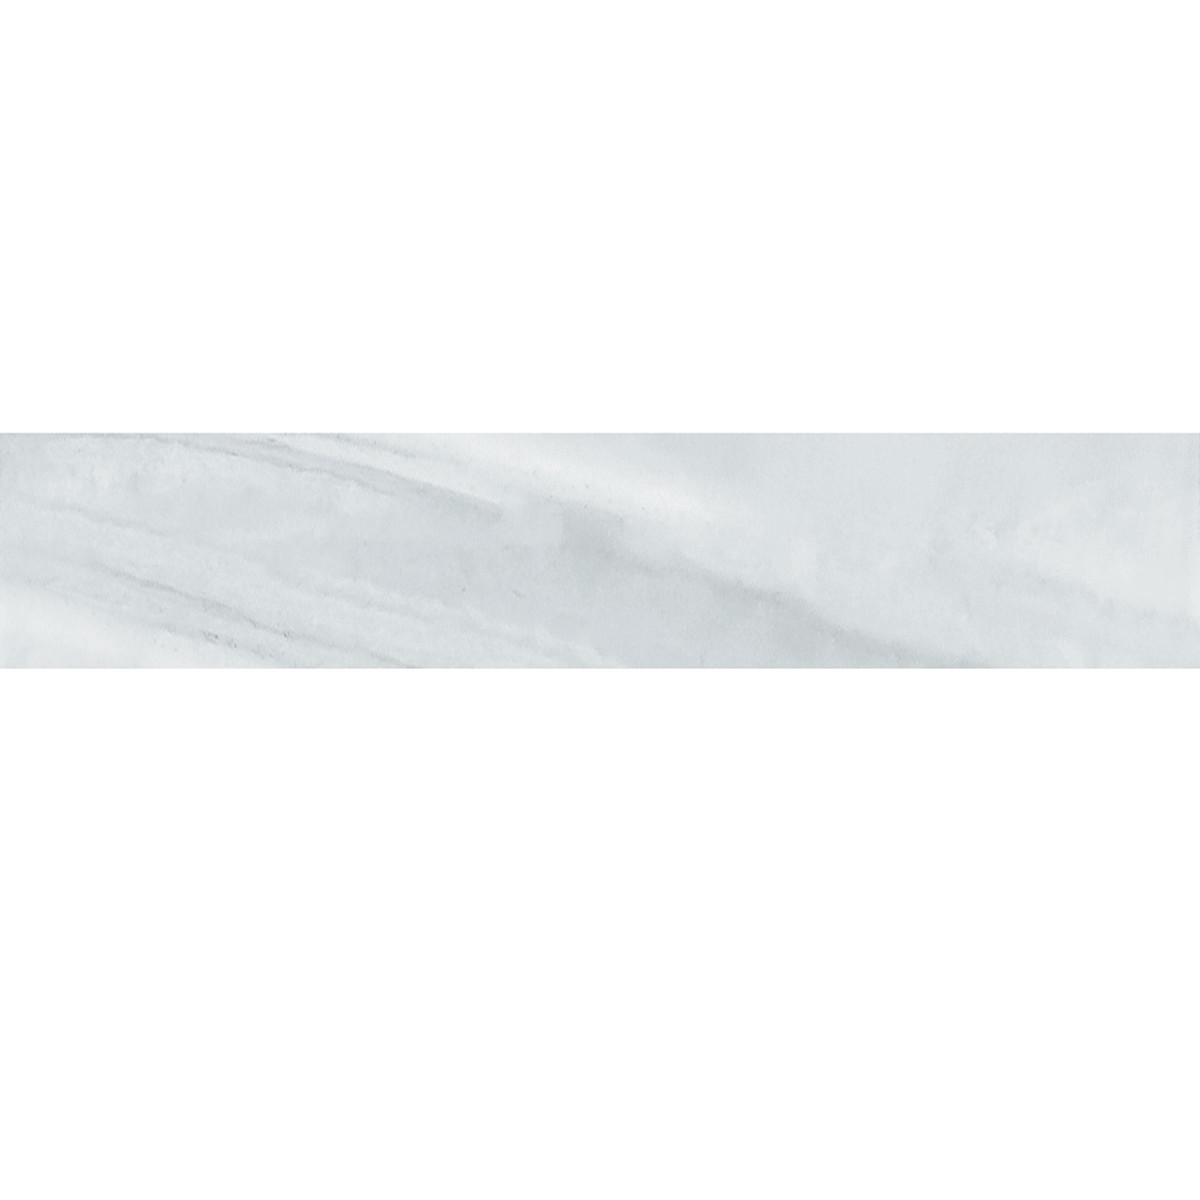 Battiscopa lux bianco 7 x 60 5 cm prezzi e offerte online for Battiscopa leroy merlin